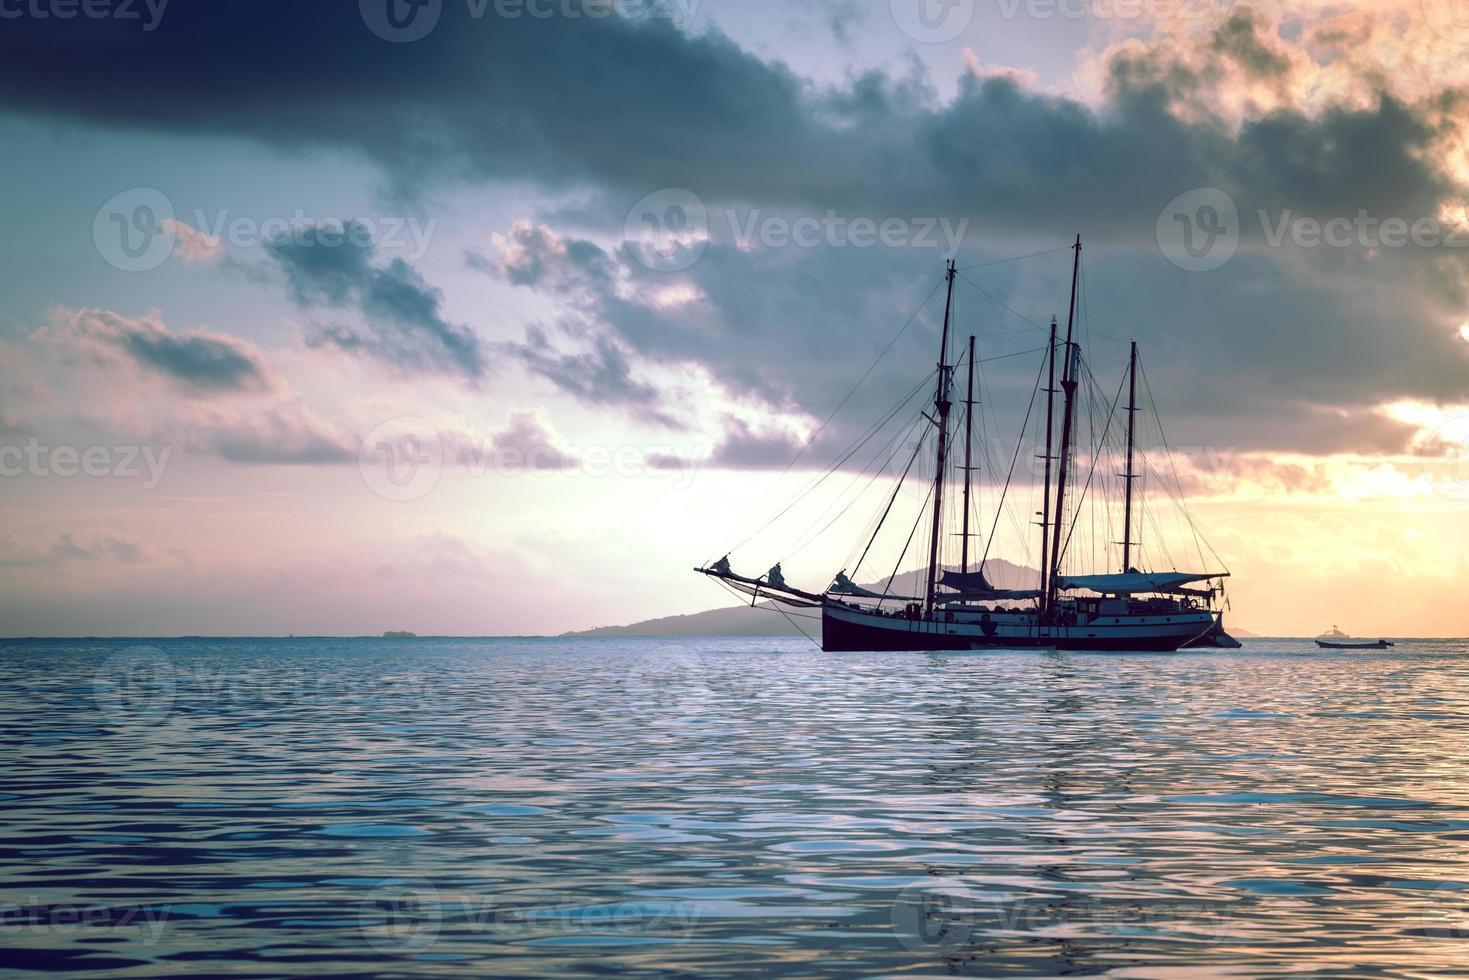 iate recreacional no Oceano Índico foto